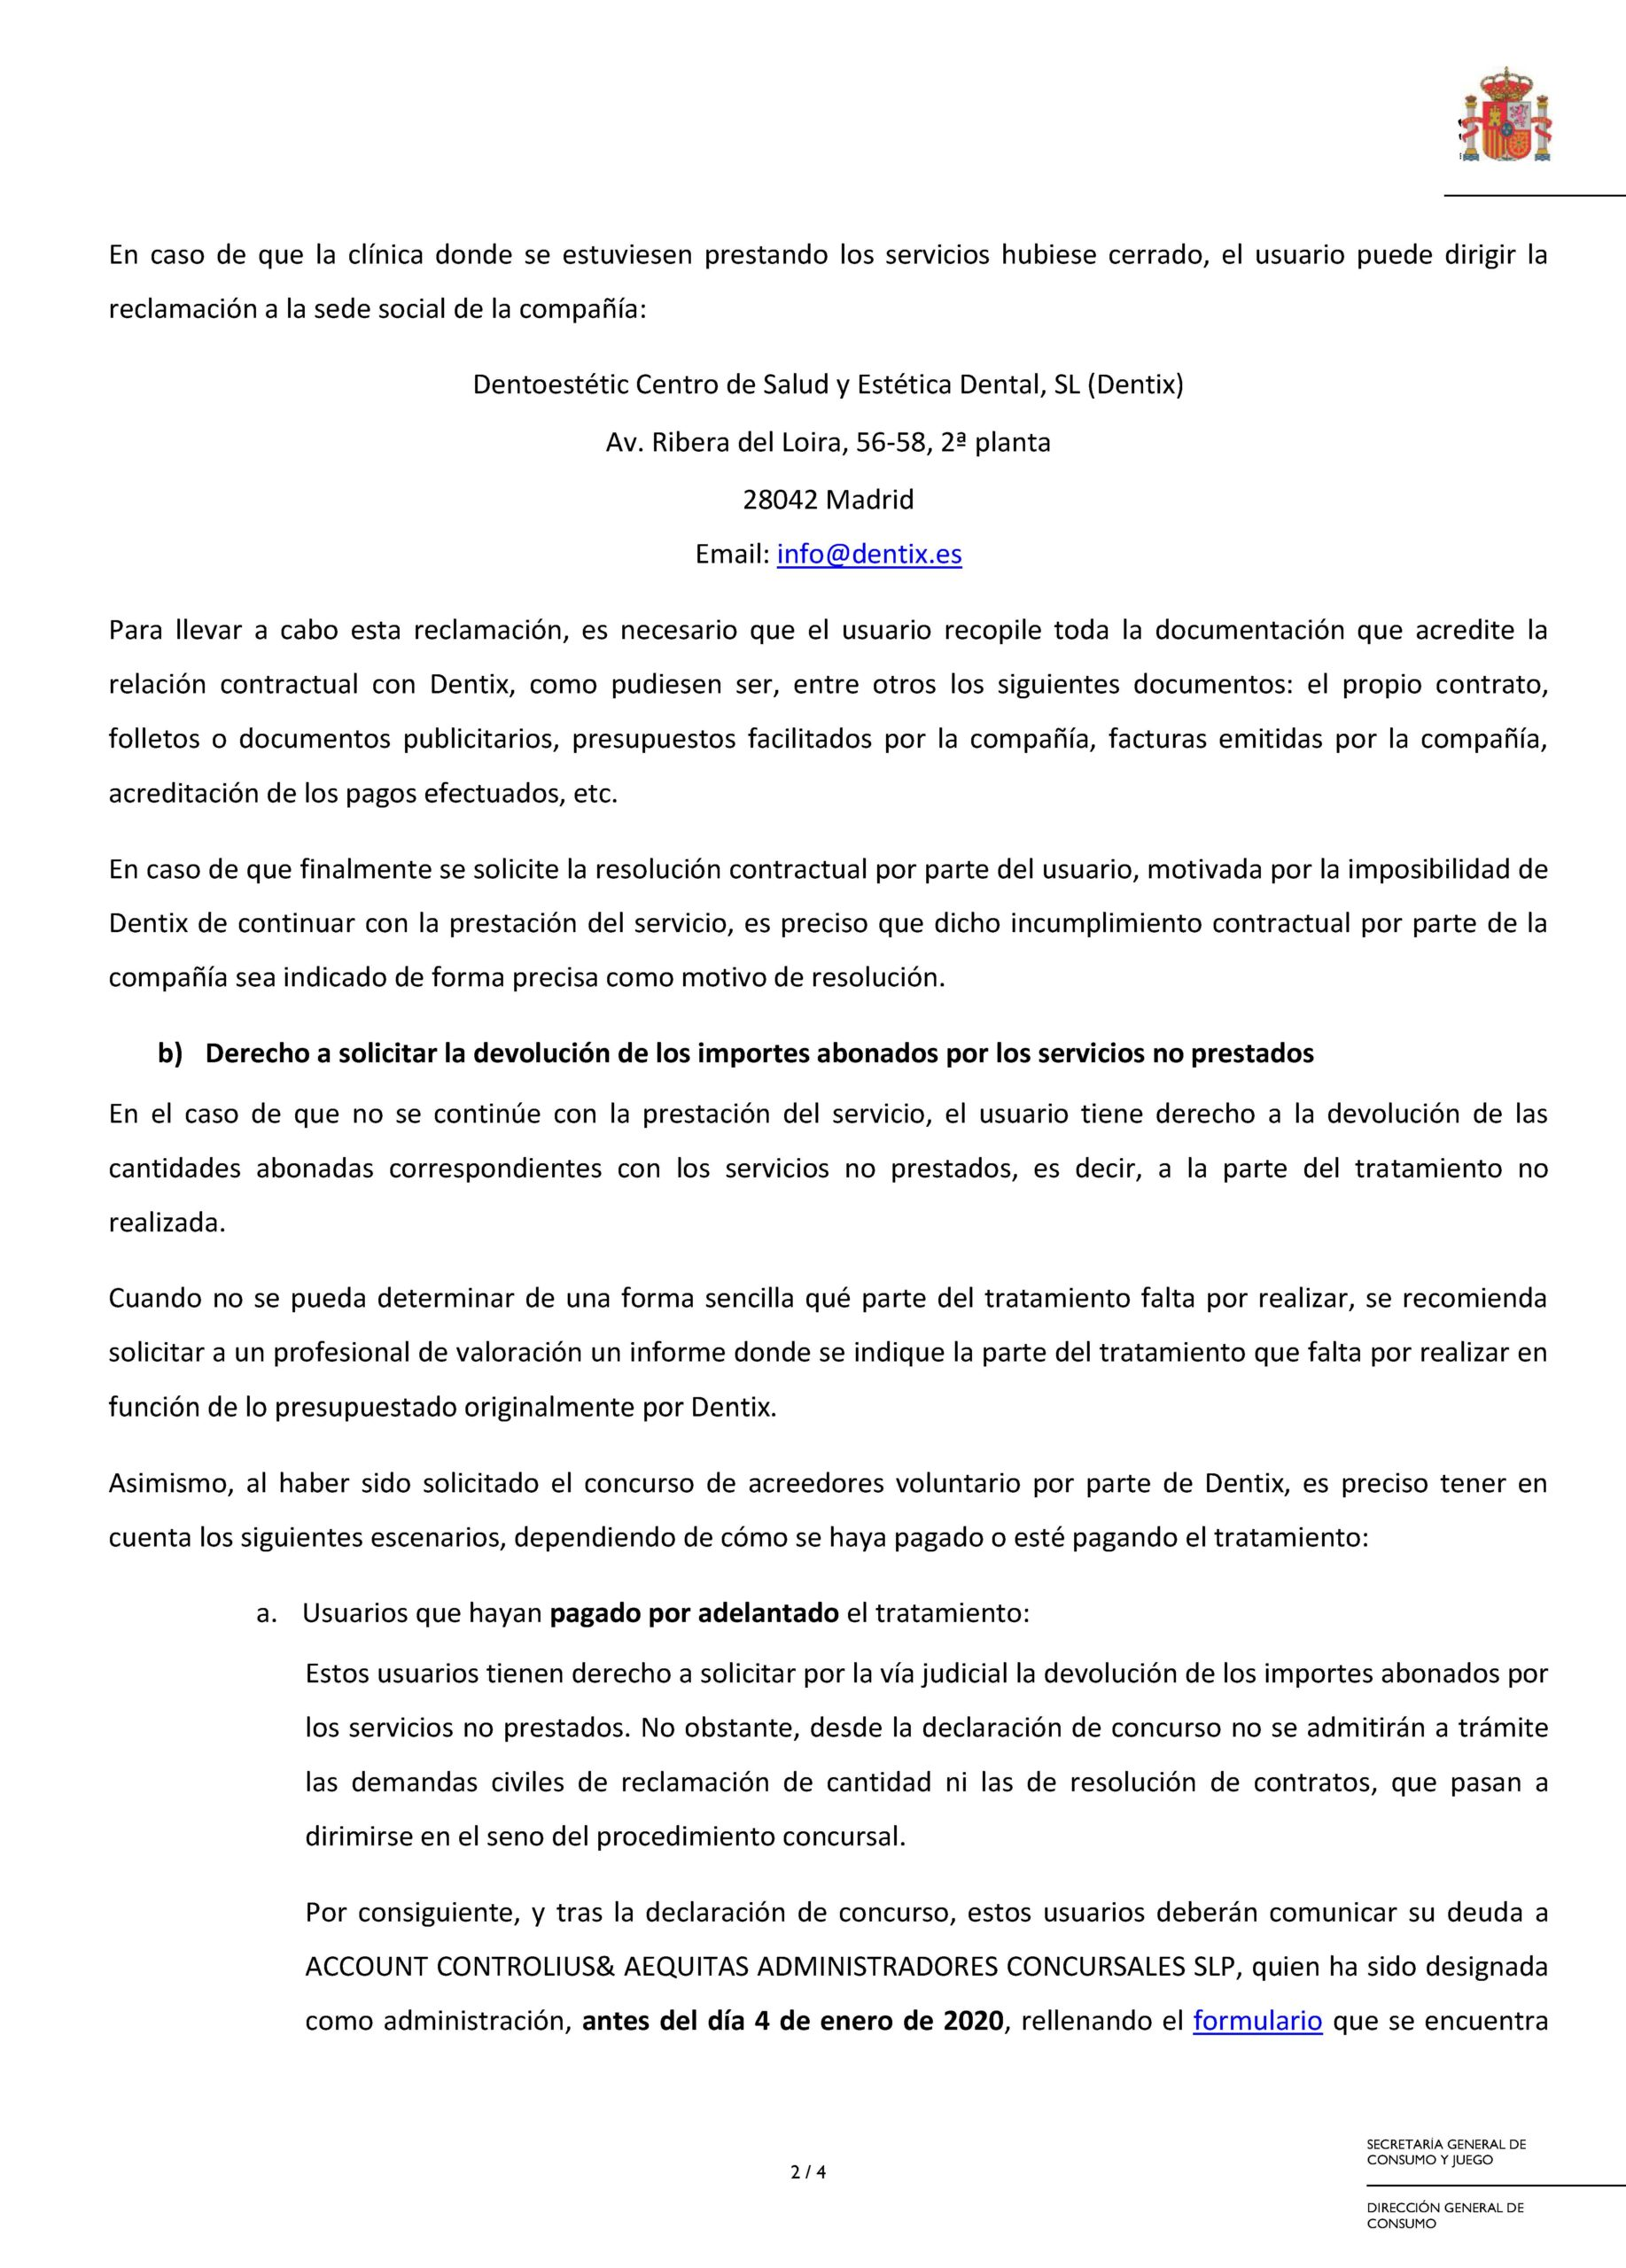 20201212 Nota informativa Dentix 2 actualizacion Pgina 2